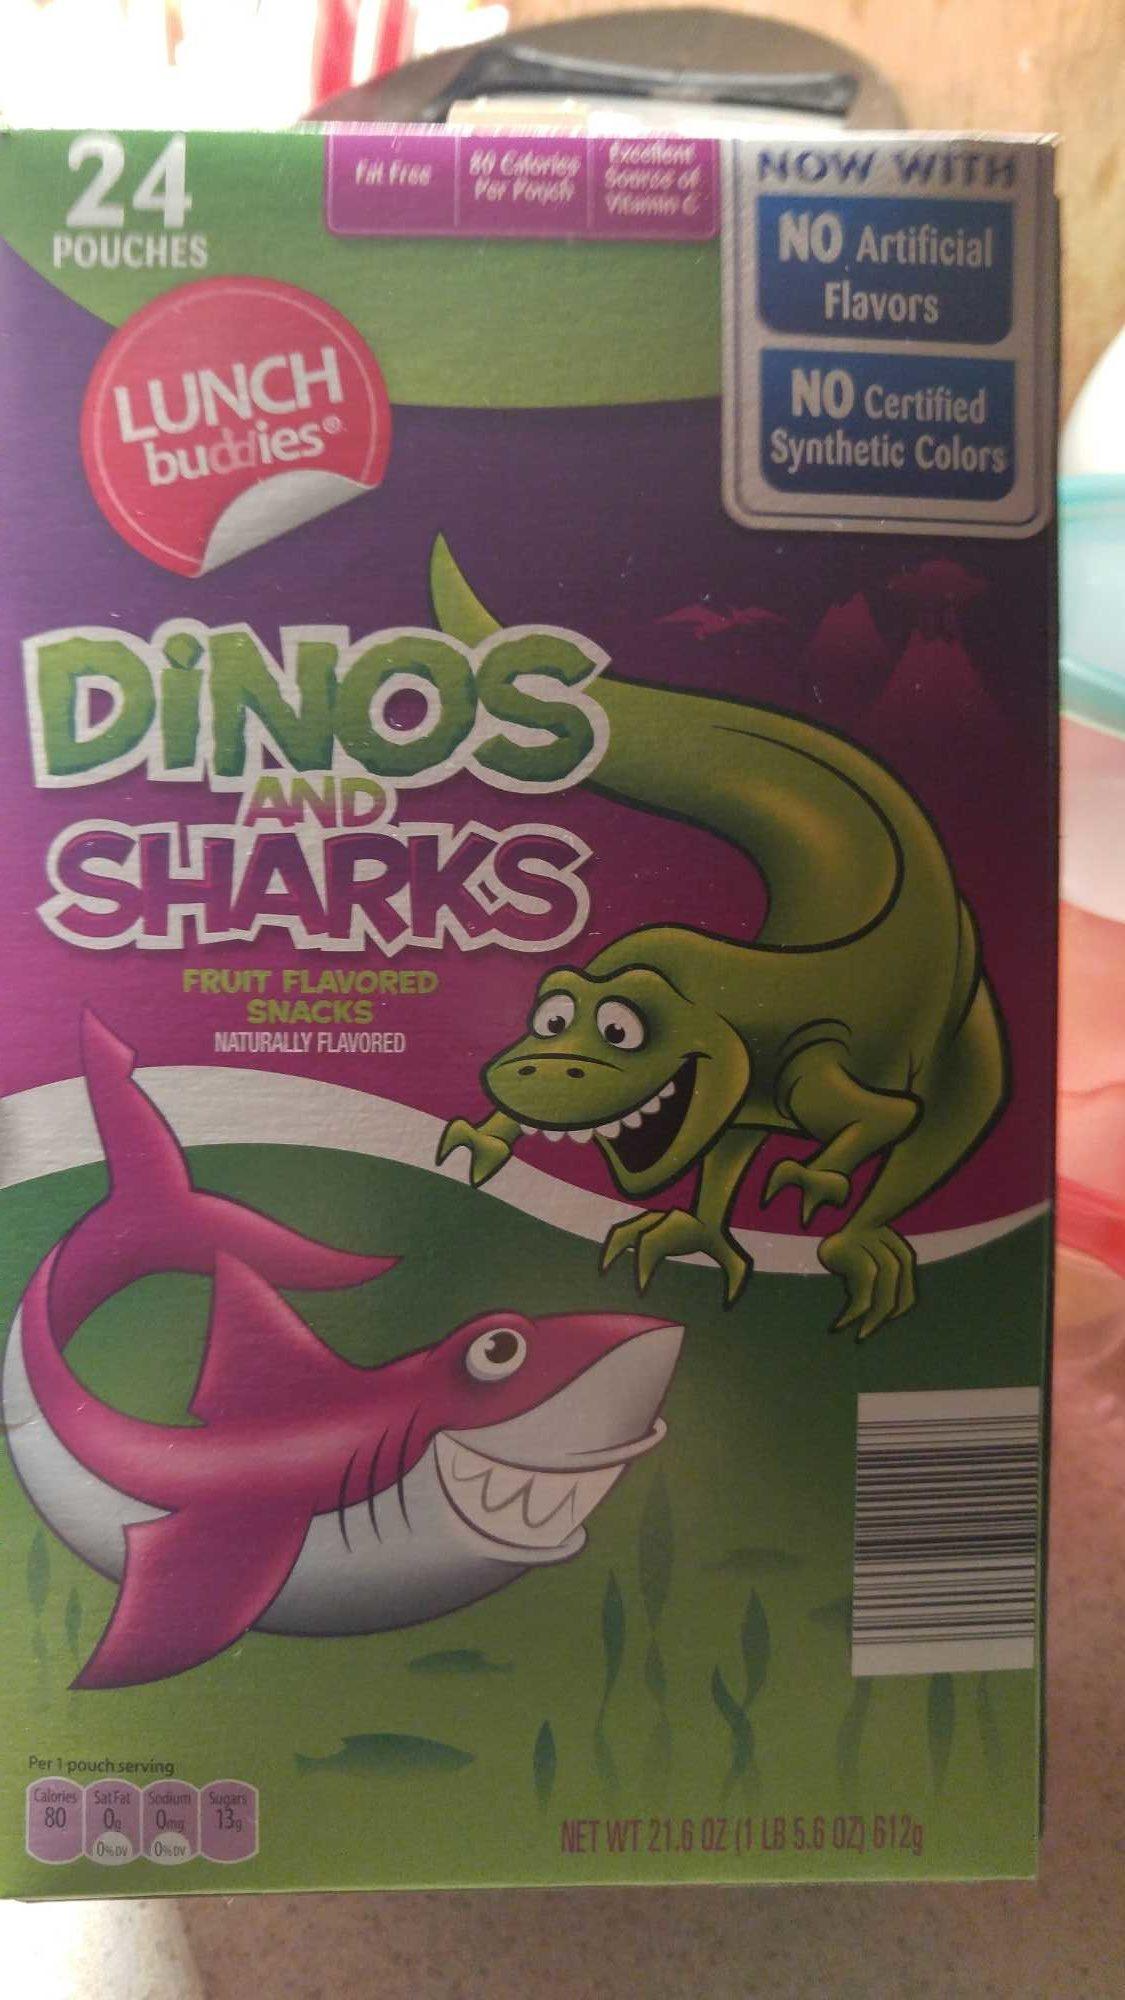 Dinos And Sharks Fruit Flavored Snacks, Strawberry, Orange, Grape, Lemon, Lime - Product - en